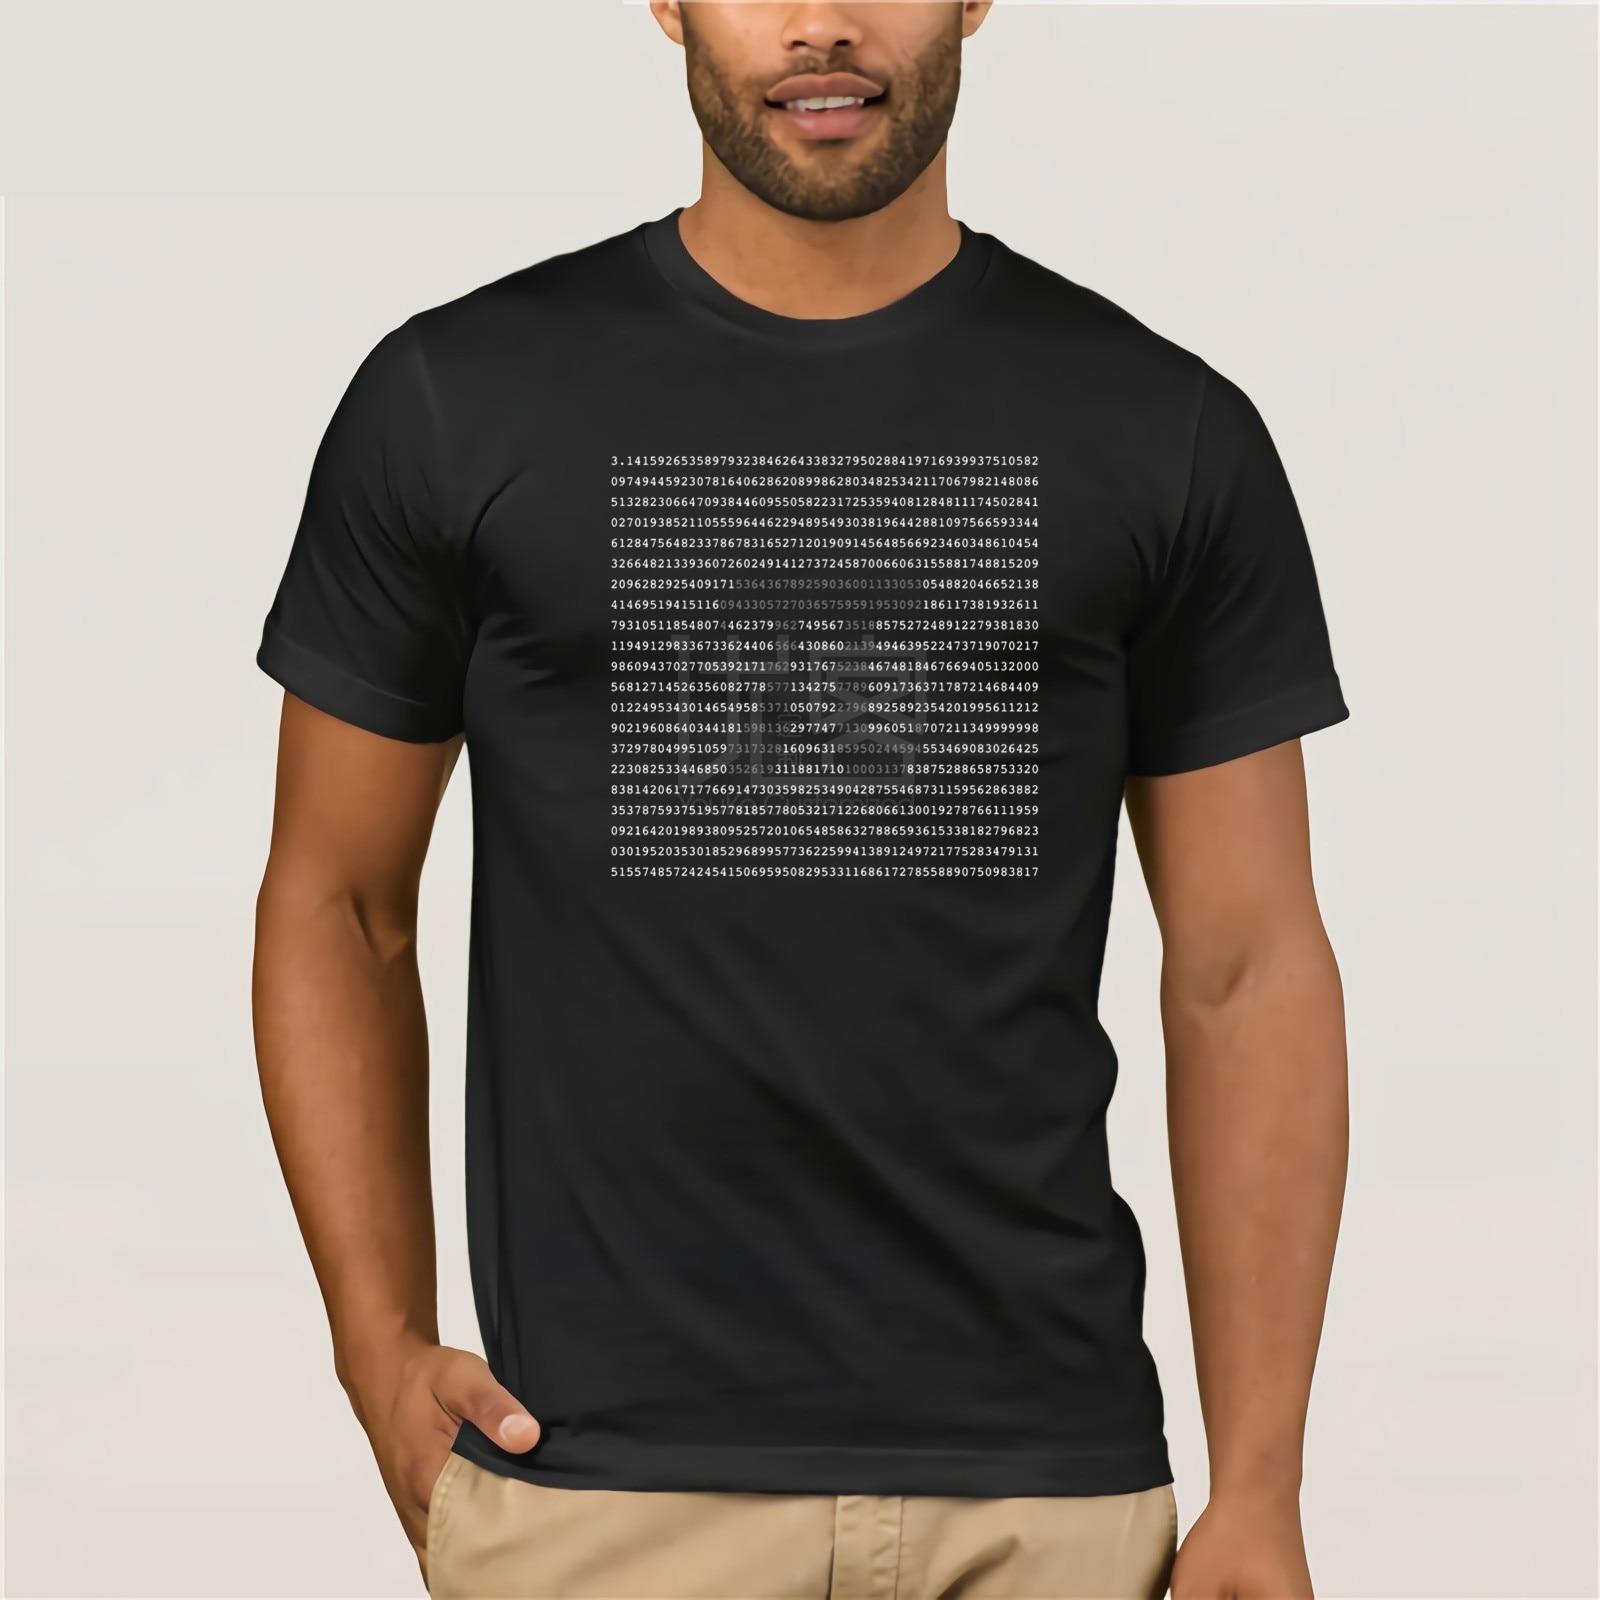 1154 Digits Of Pi T-Shirt  Men's Round Neck Short Sleeve T-Shirt  Top T-shirt Men's Short Sleeve